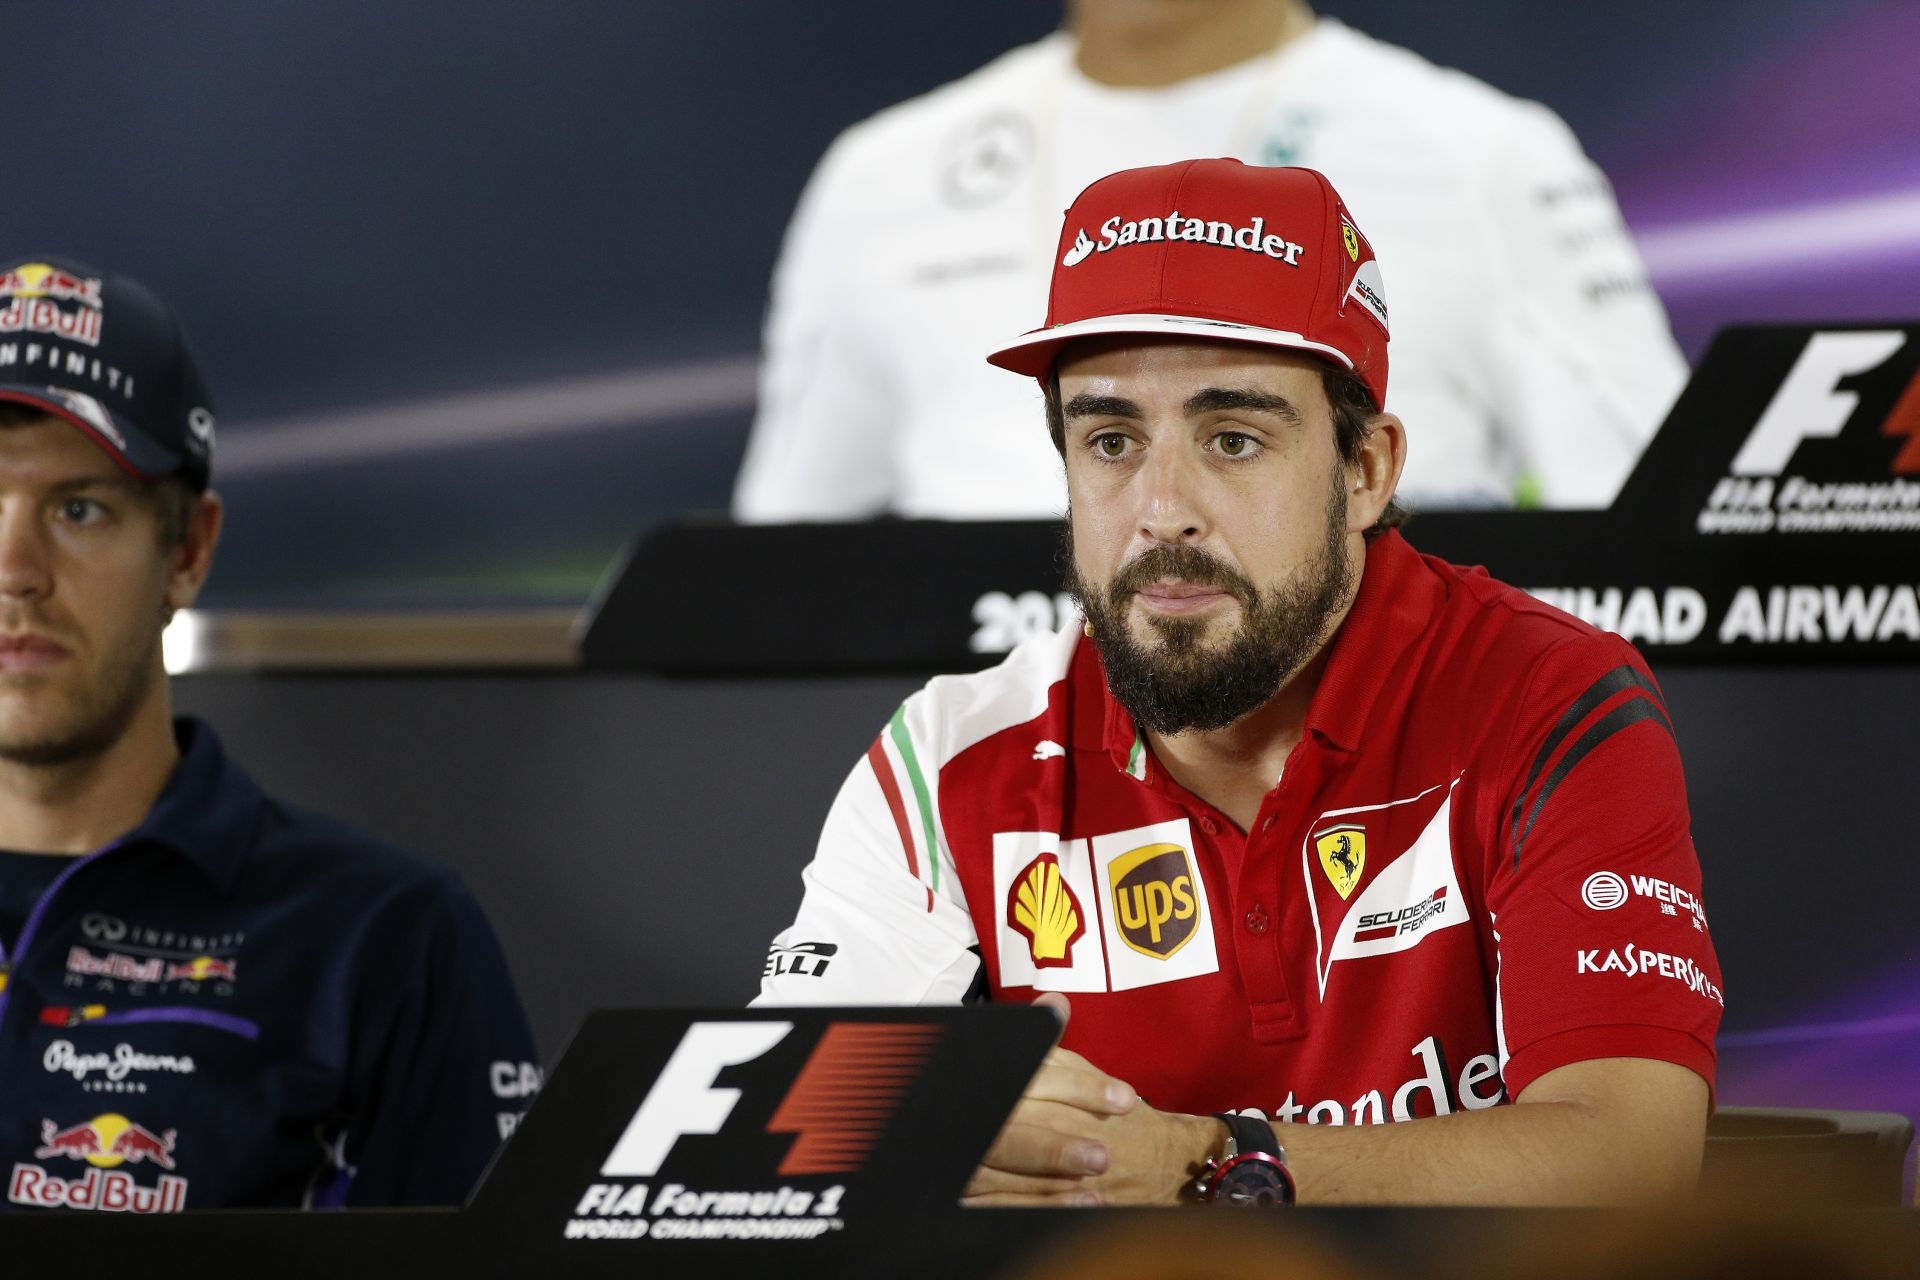 I. János Károly király: Alonso a McLarennél folytatja tovább (Frissítve)